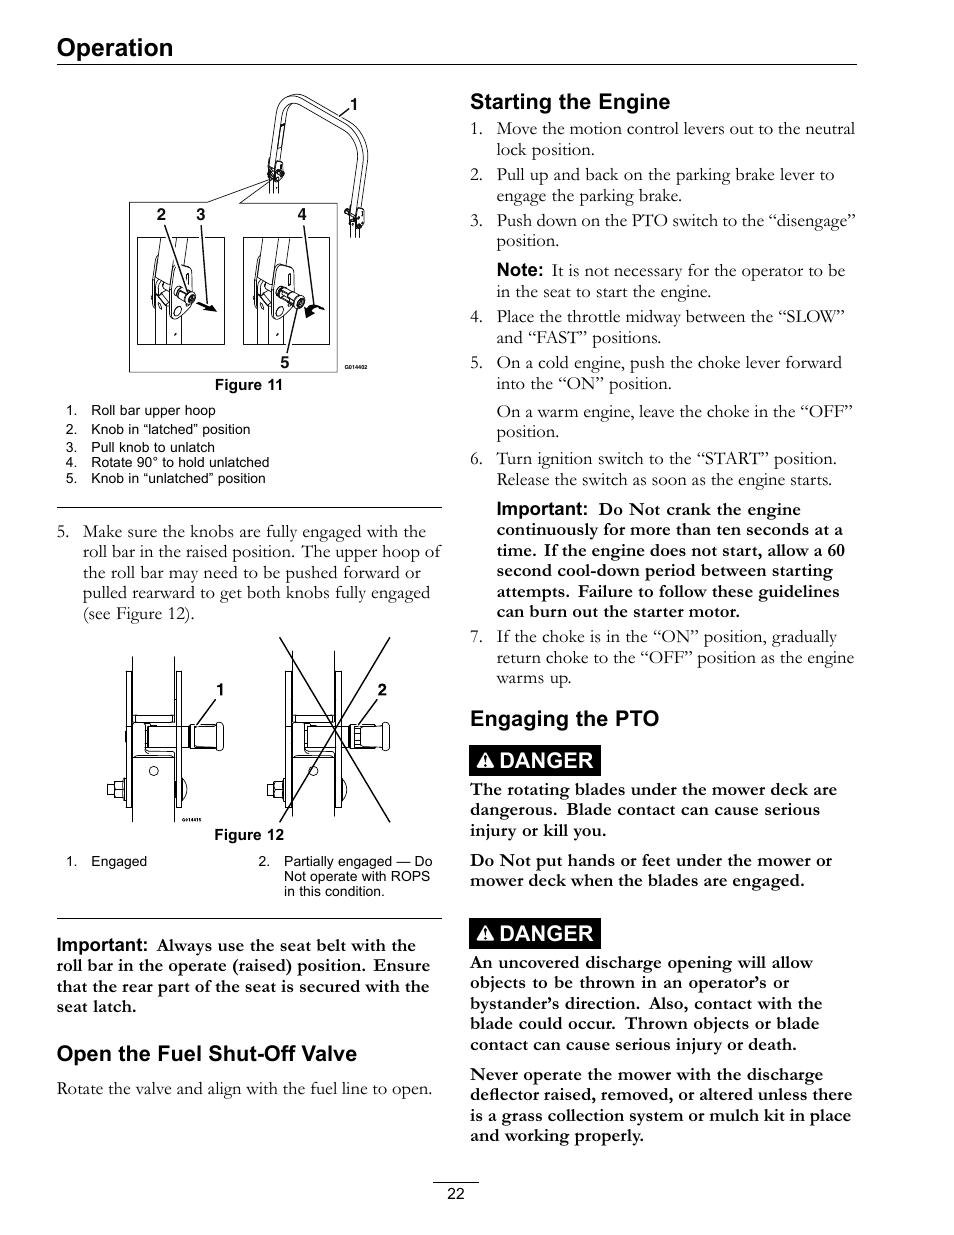 operation open the fuel shut off valve starting the engine rh manualsdir com exmark 708cc v-twin engine manual exmark 708cc engine manual